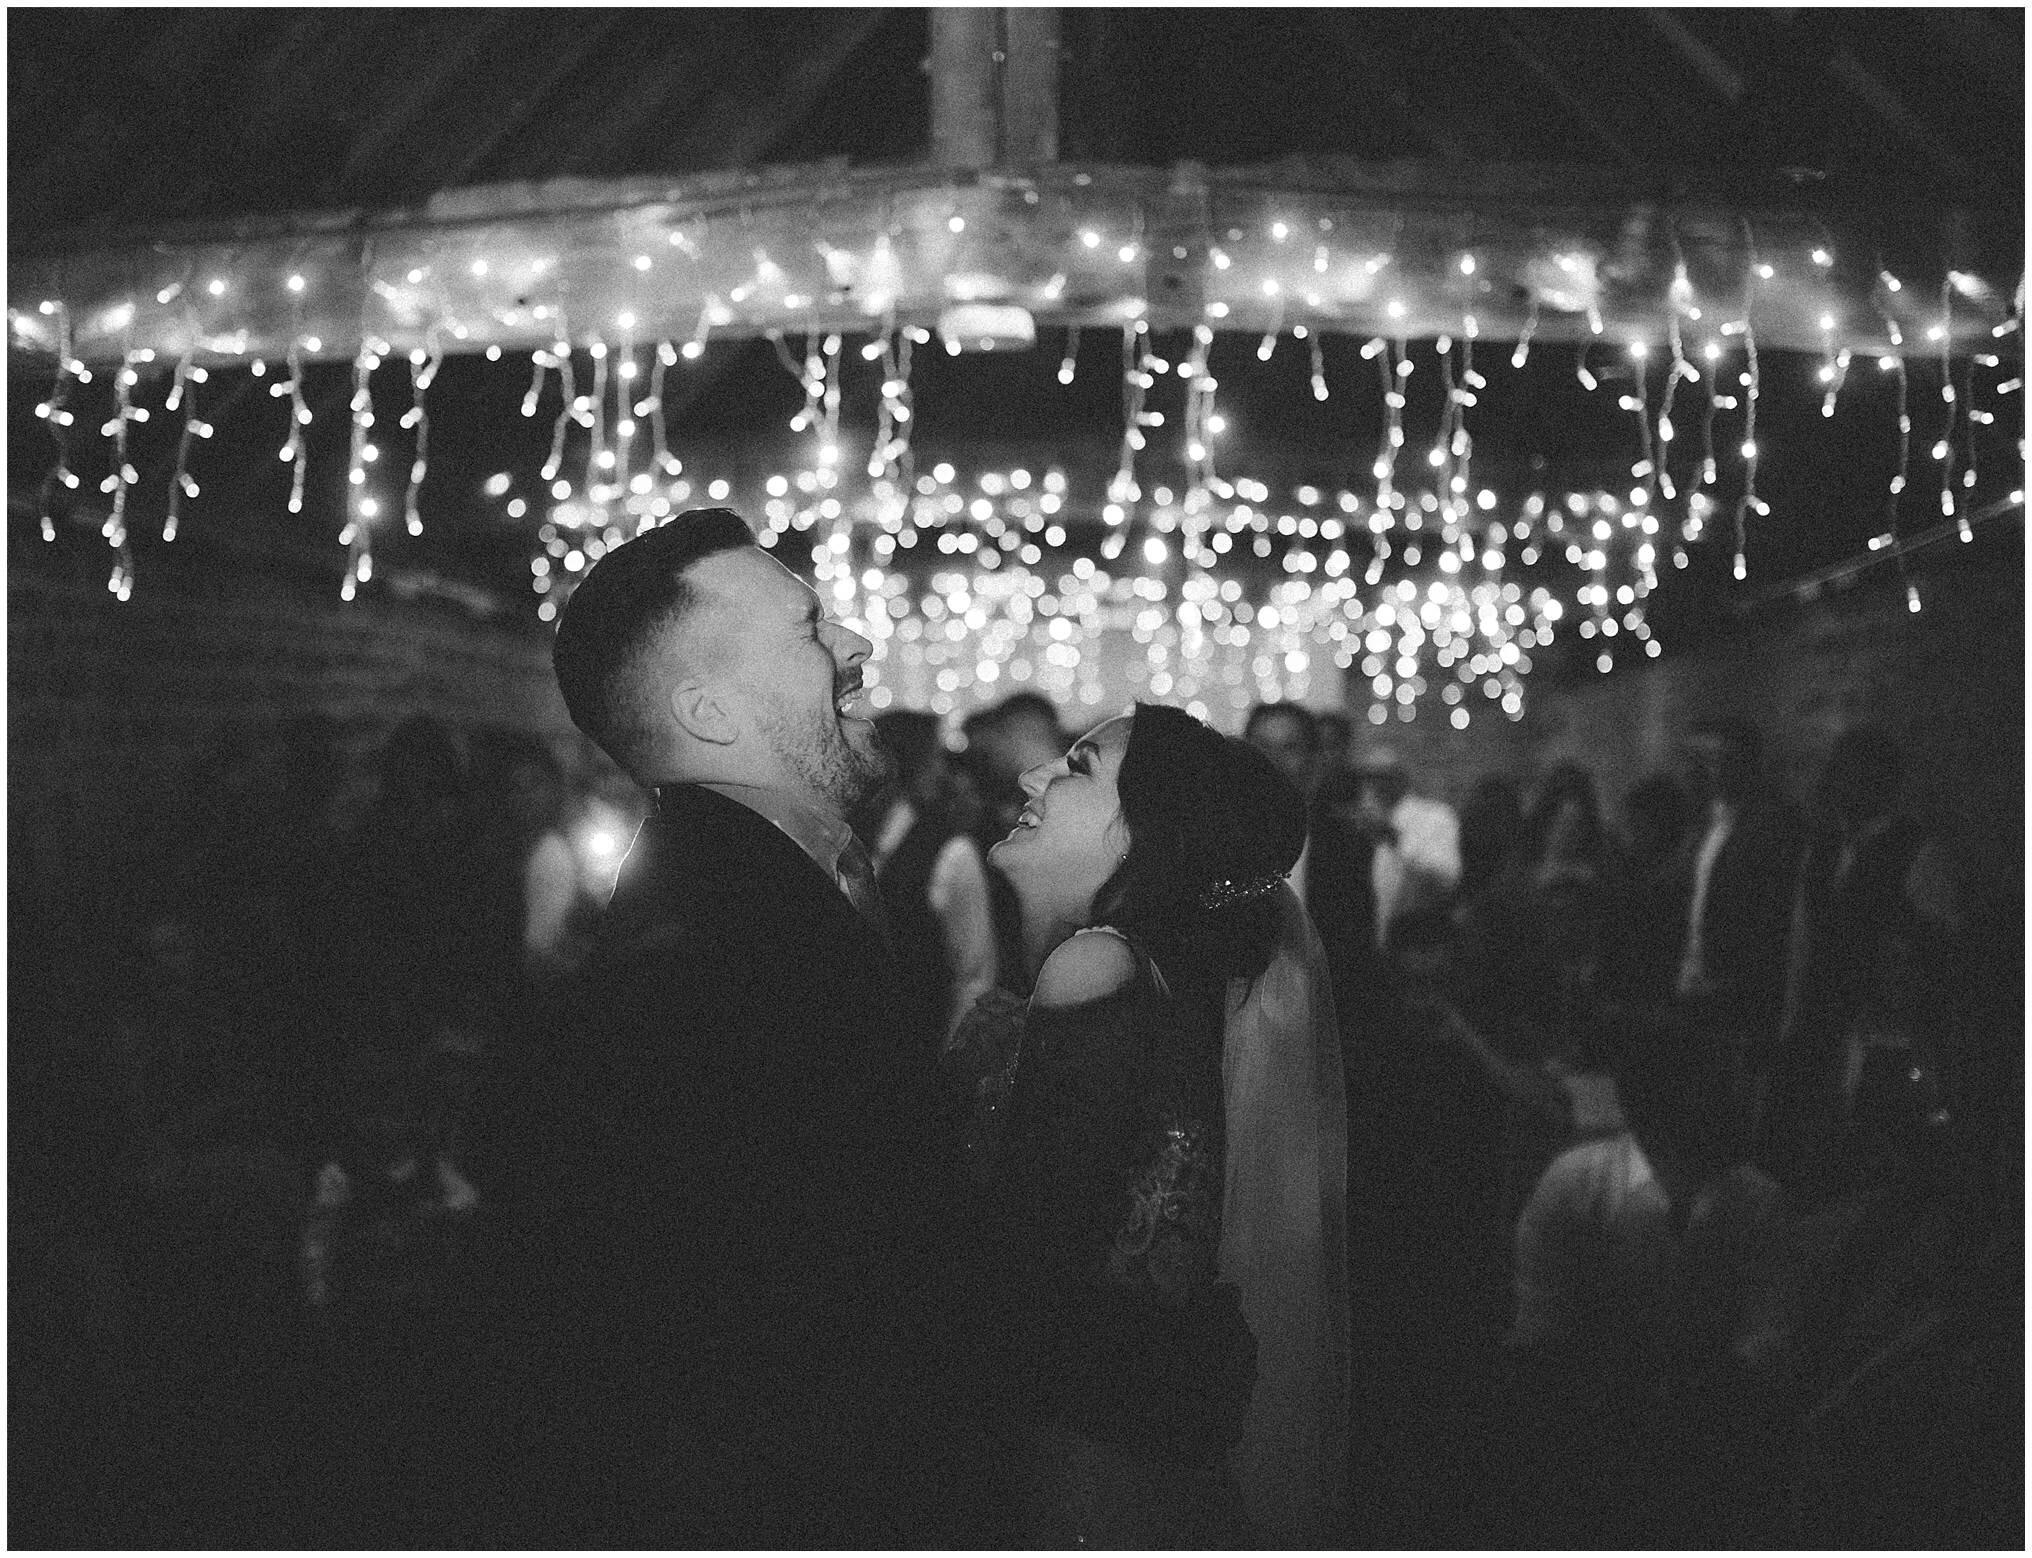 dronfield barn wedding photographer011.jpg